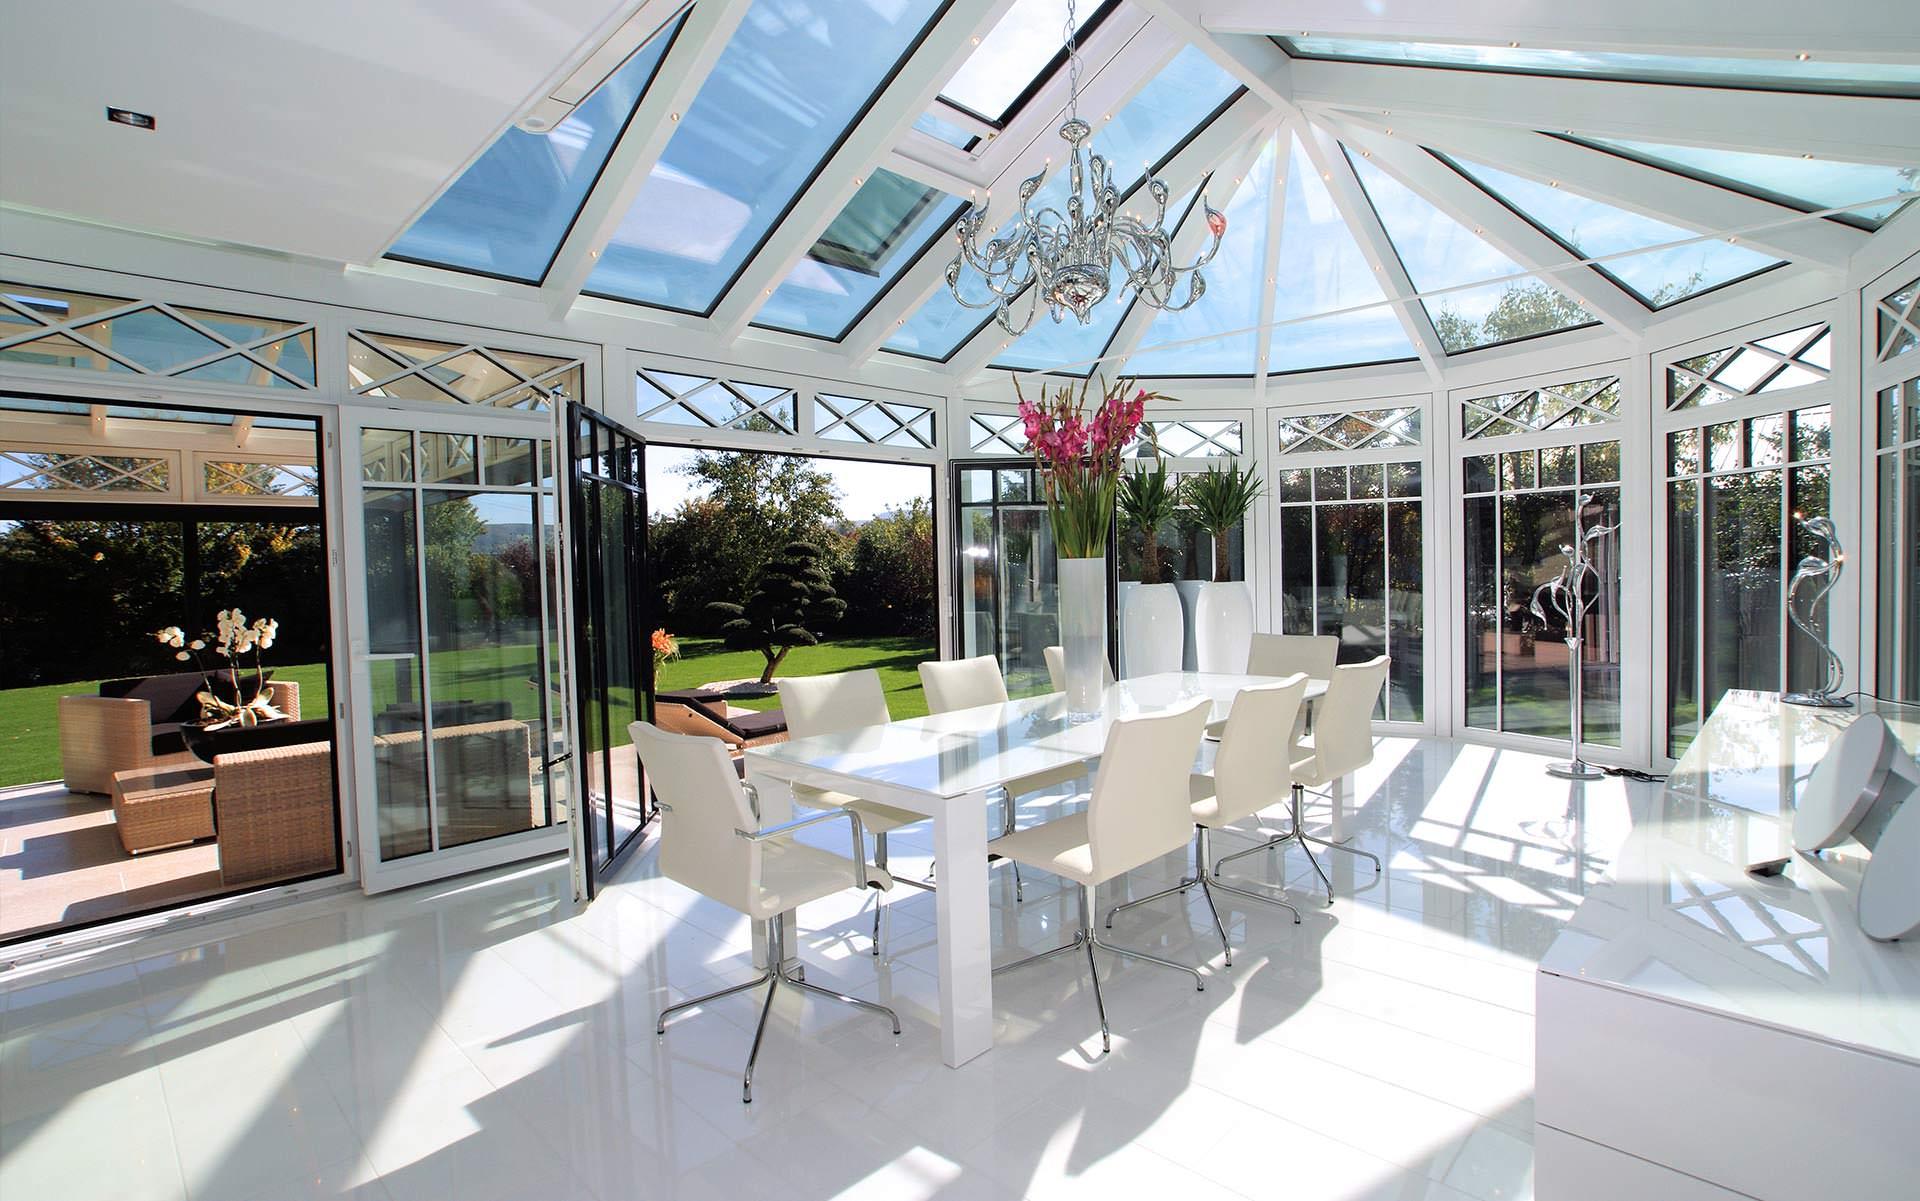 viktorianischer wintergarten innen bundesverband wintergarten e v. Black Bedroom Furniture Sets. Home Design Ideas